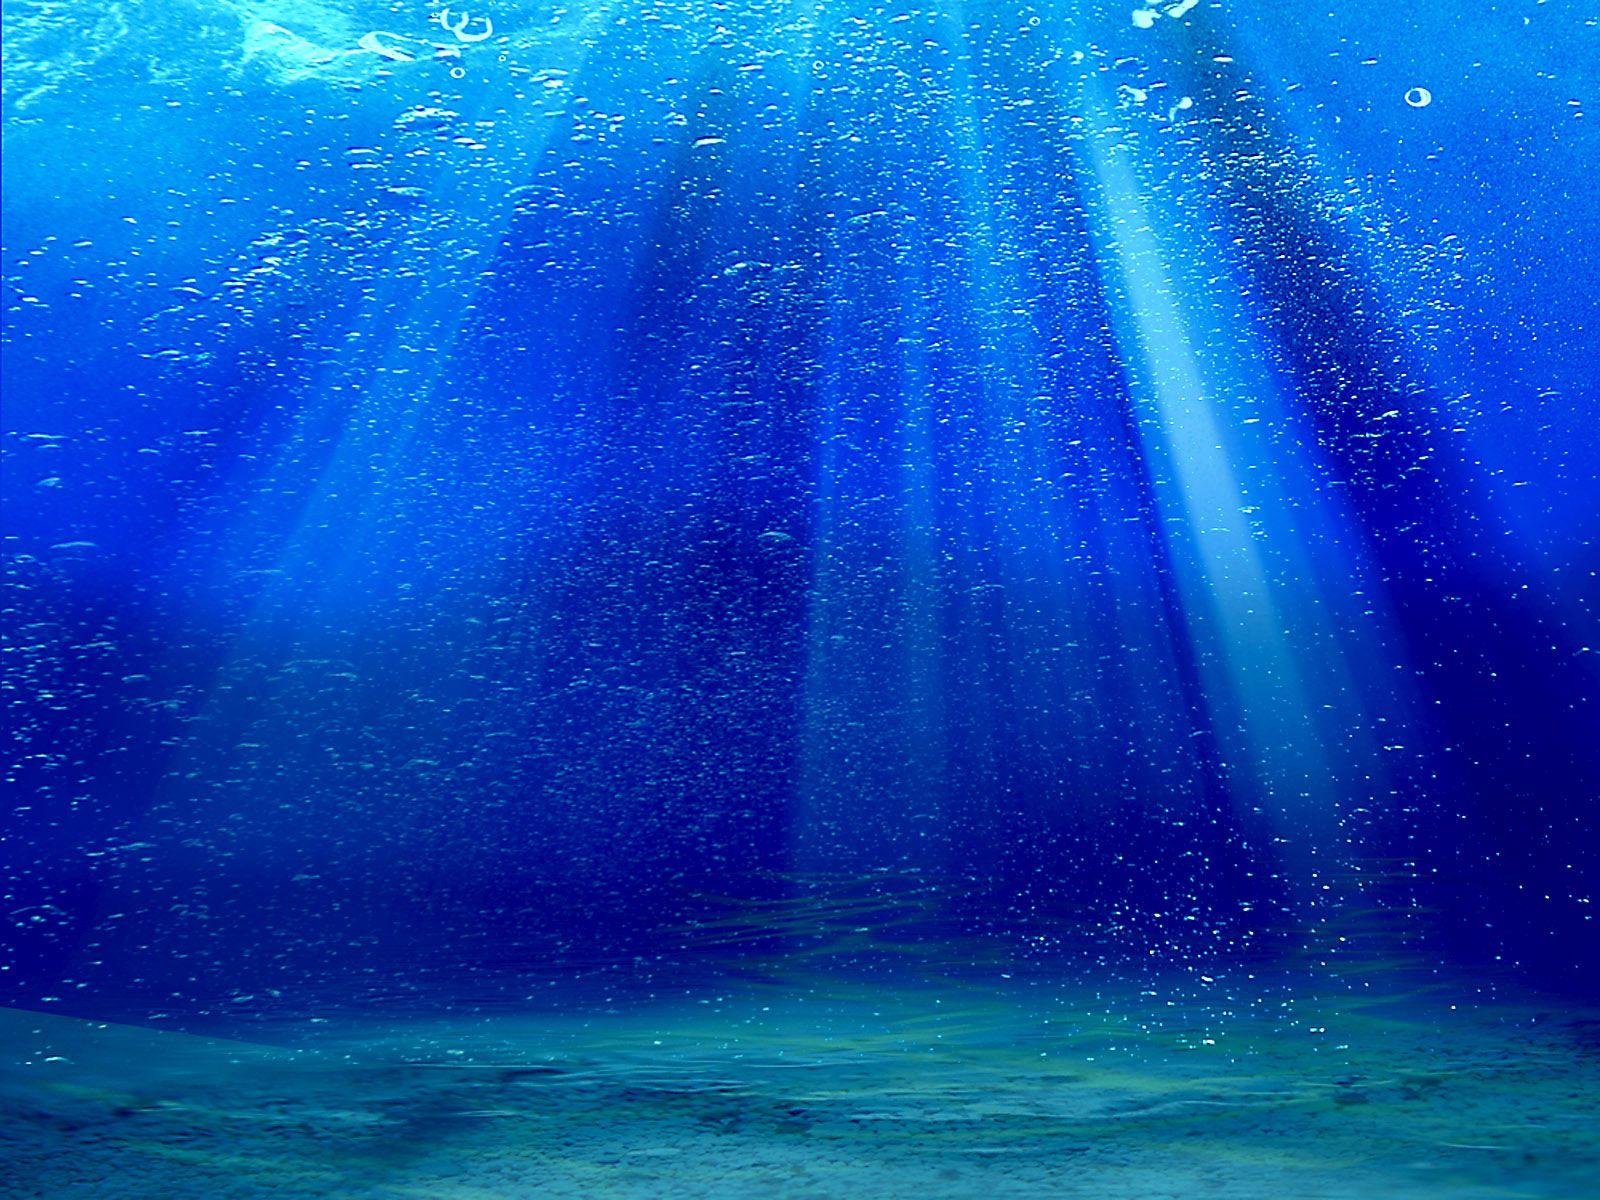 Google Image Result for http://2.bp.blogspot.com/-qYkF9wWCUFE/UHDo893kniI/AAAAAAAAAe8/1vBU2sxeTEE/s1600/deep_blue_sea_by_mudukrull.jpg